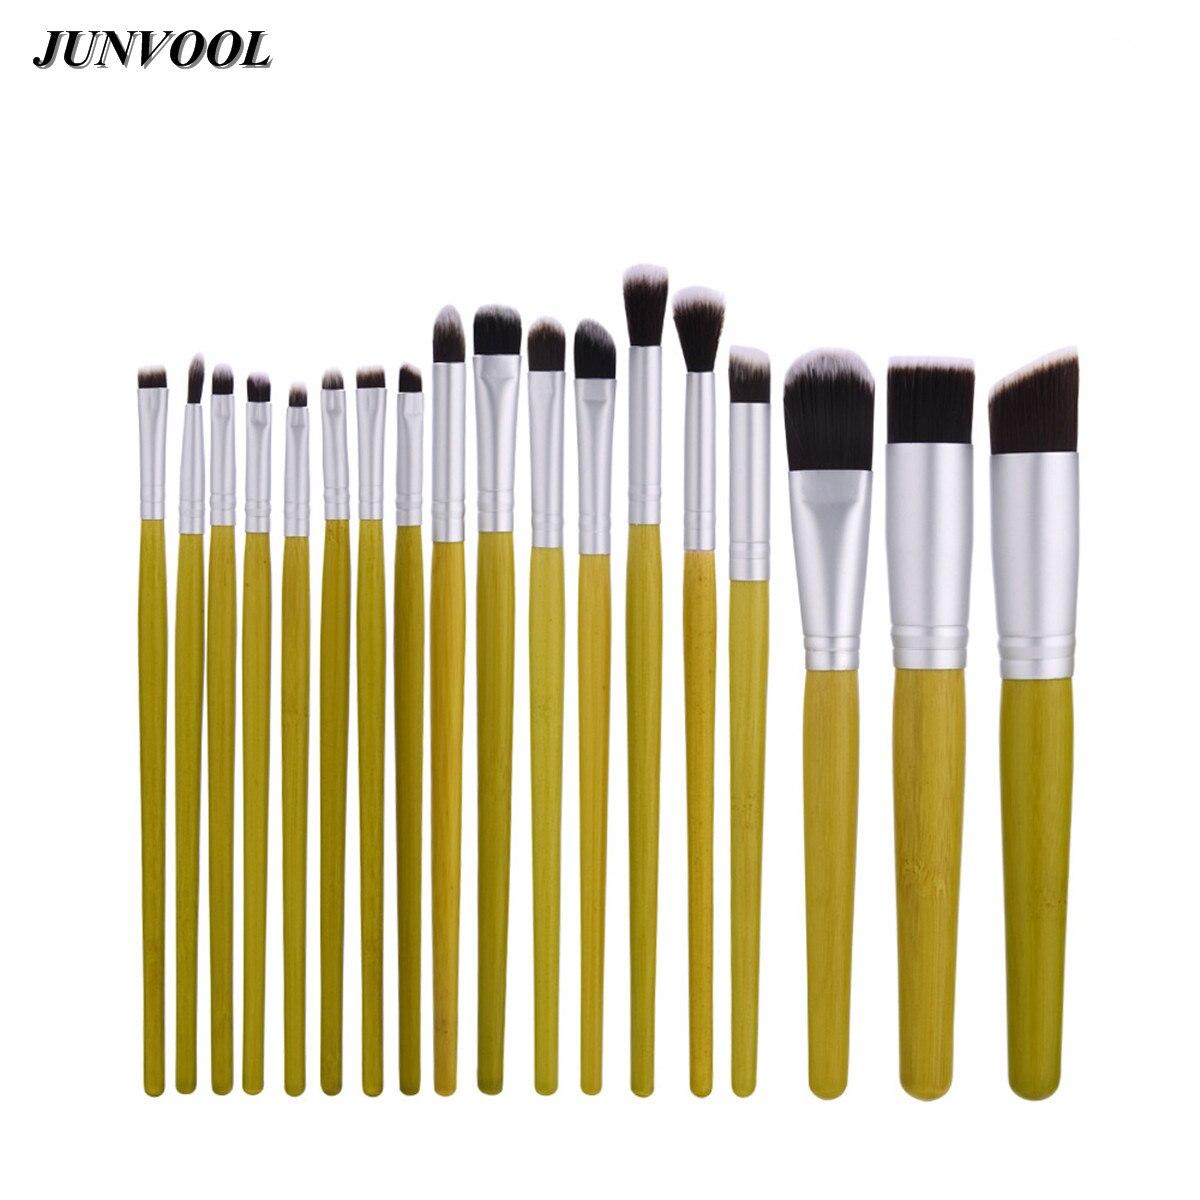 18pcs Geen Foundation Blending Brush Tools Natural Bamboo Professional Make Up Brushes Set Cosmetic Kits Makeup Set Brusher New professional bullet style cosmetic make up foundation soft brush golden white